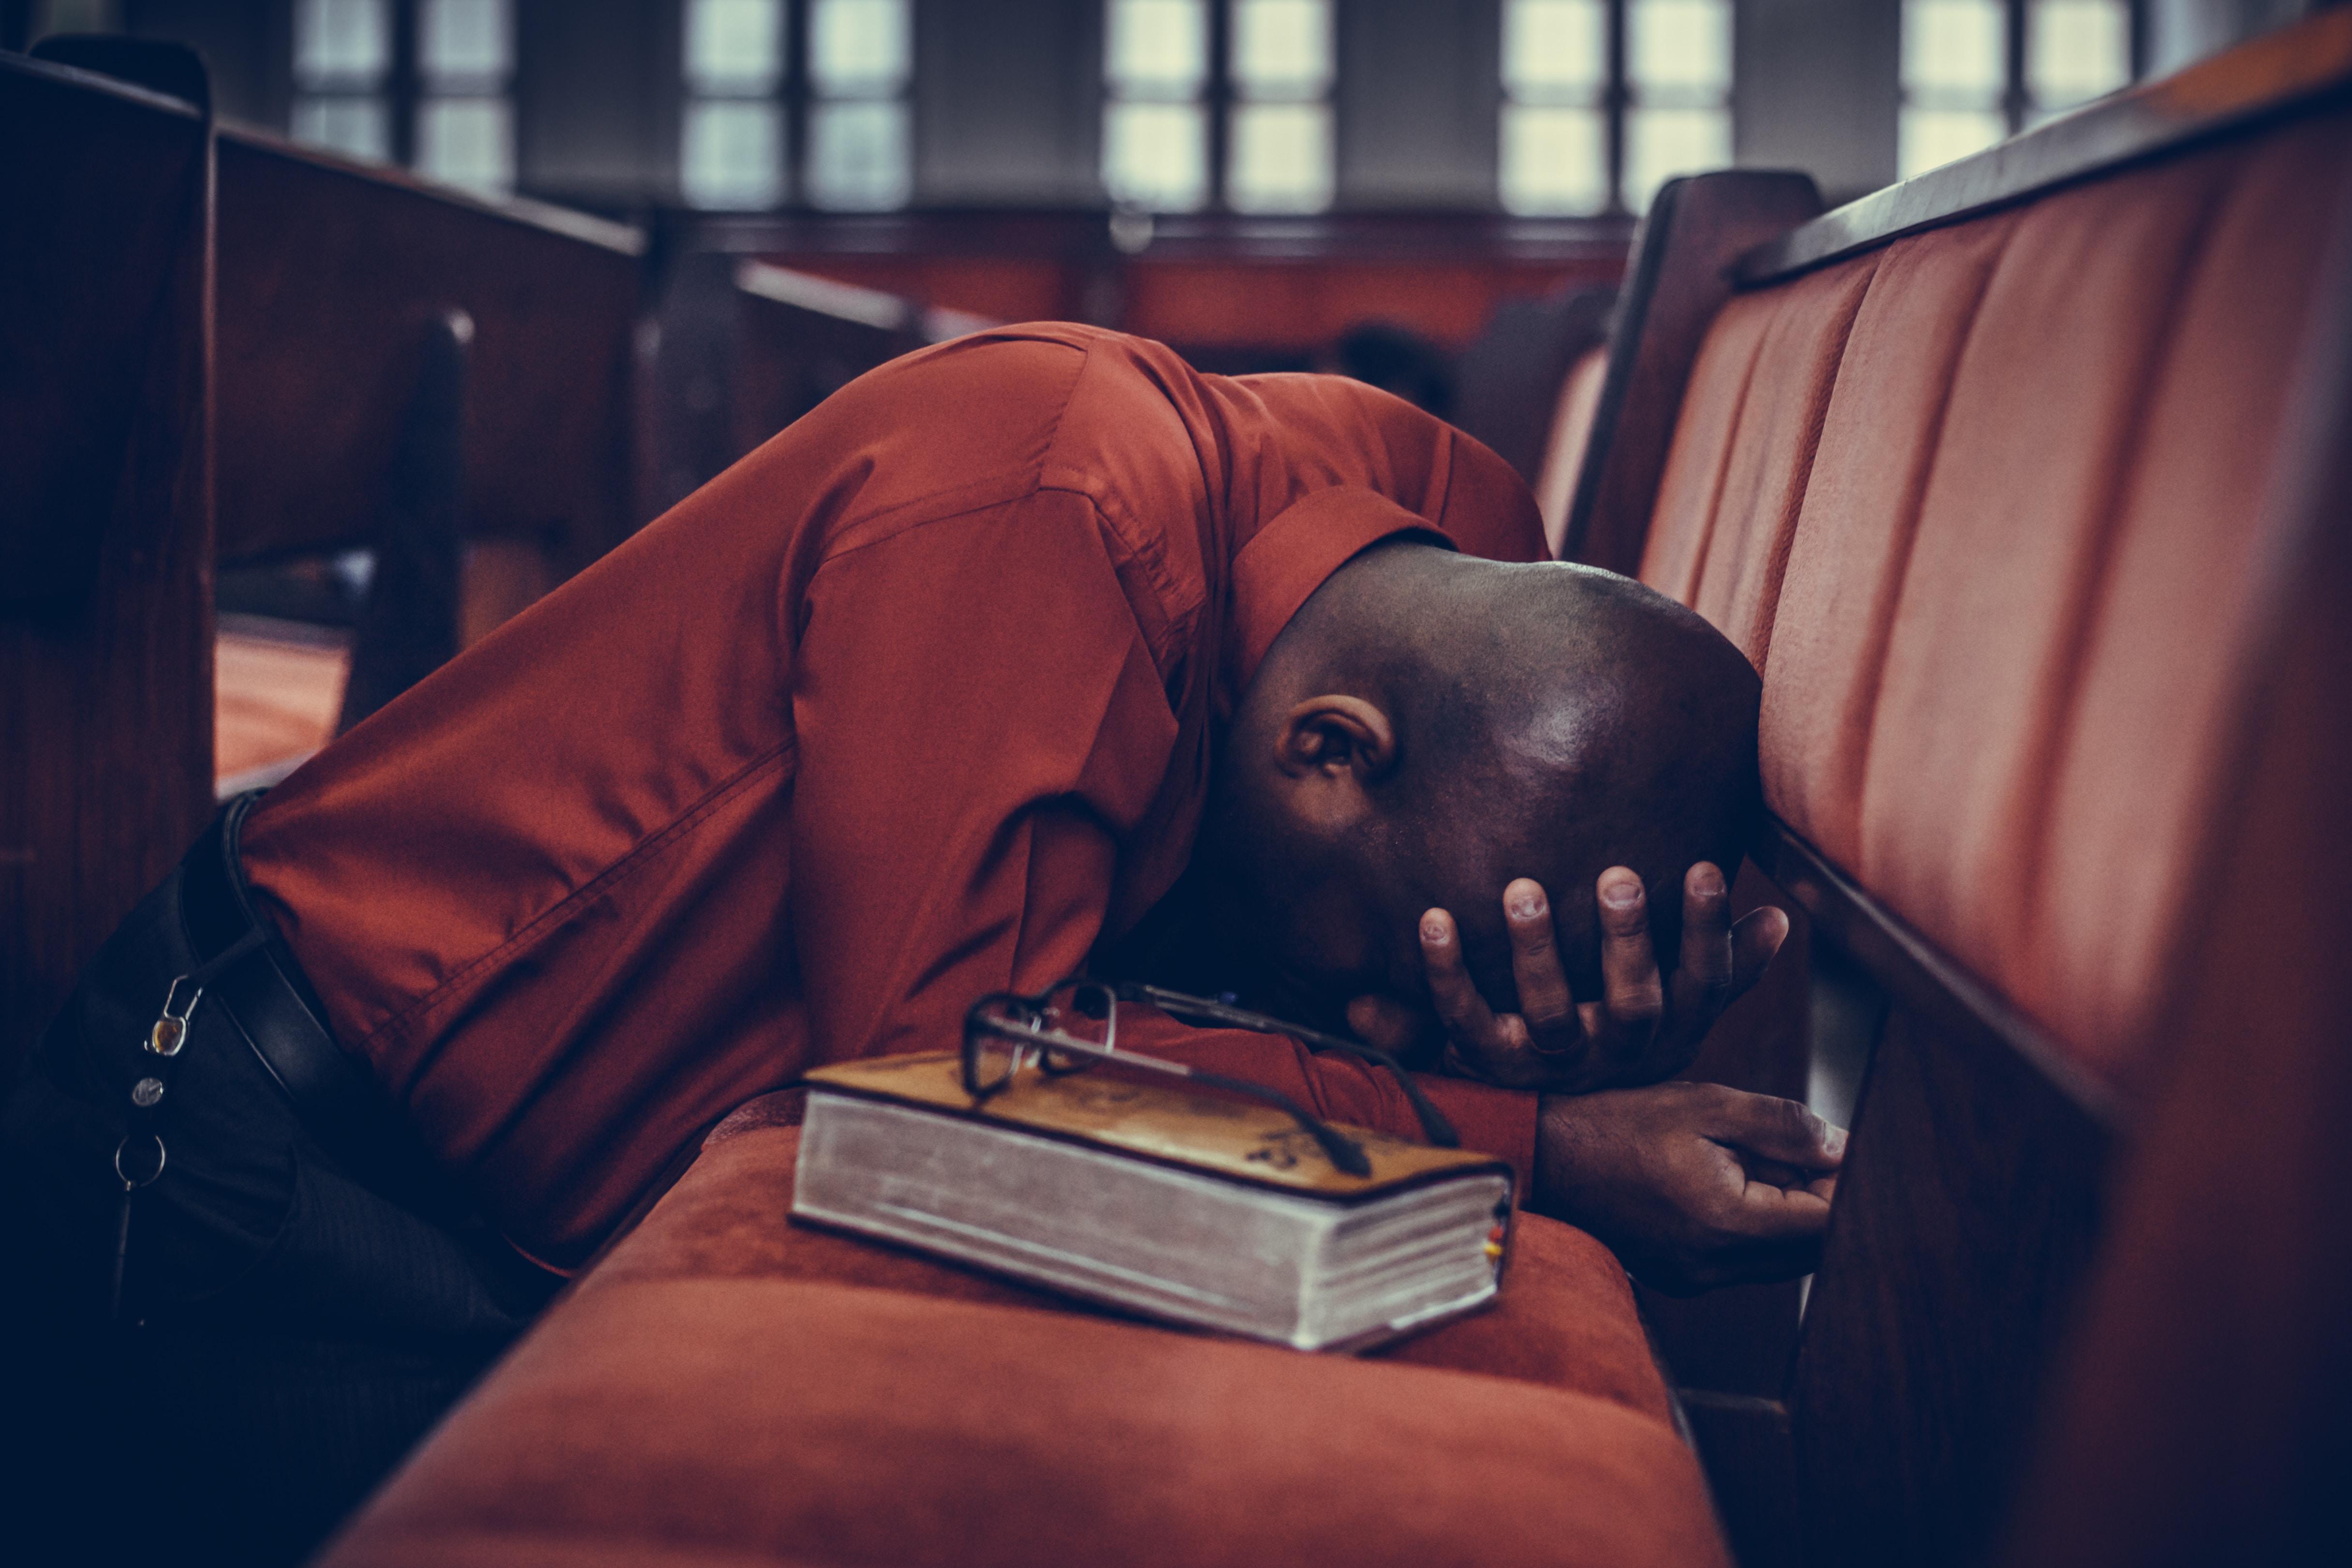 Brokenness, Bible translation, and prayer